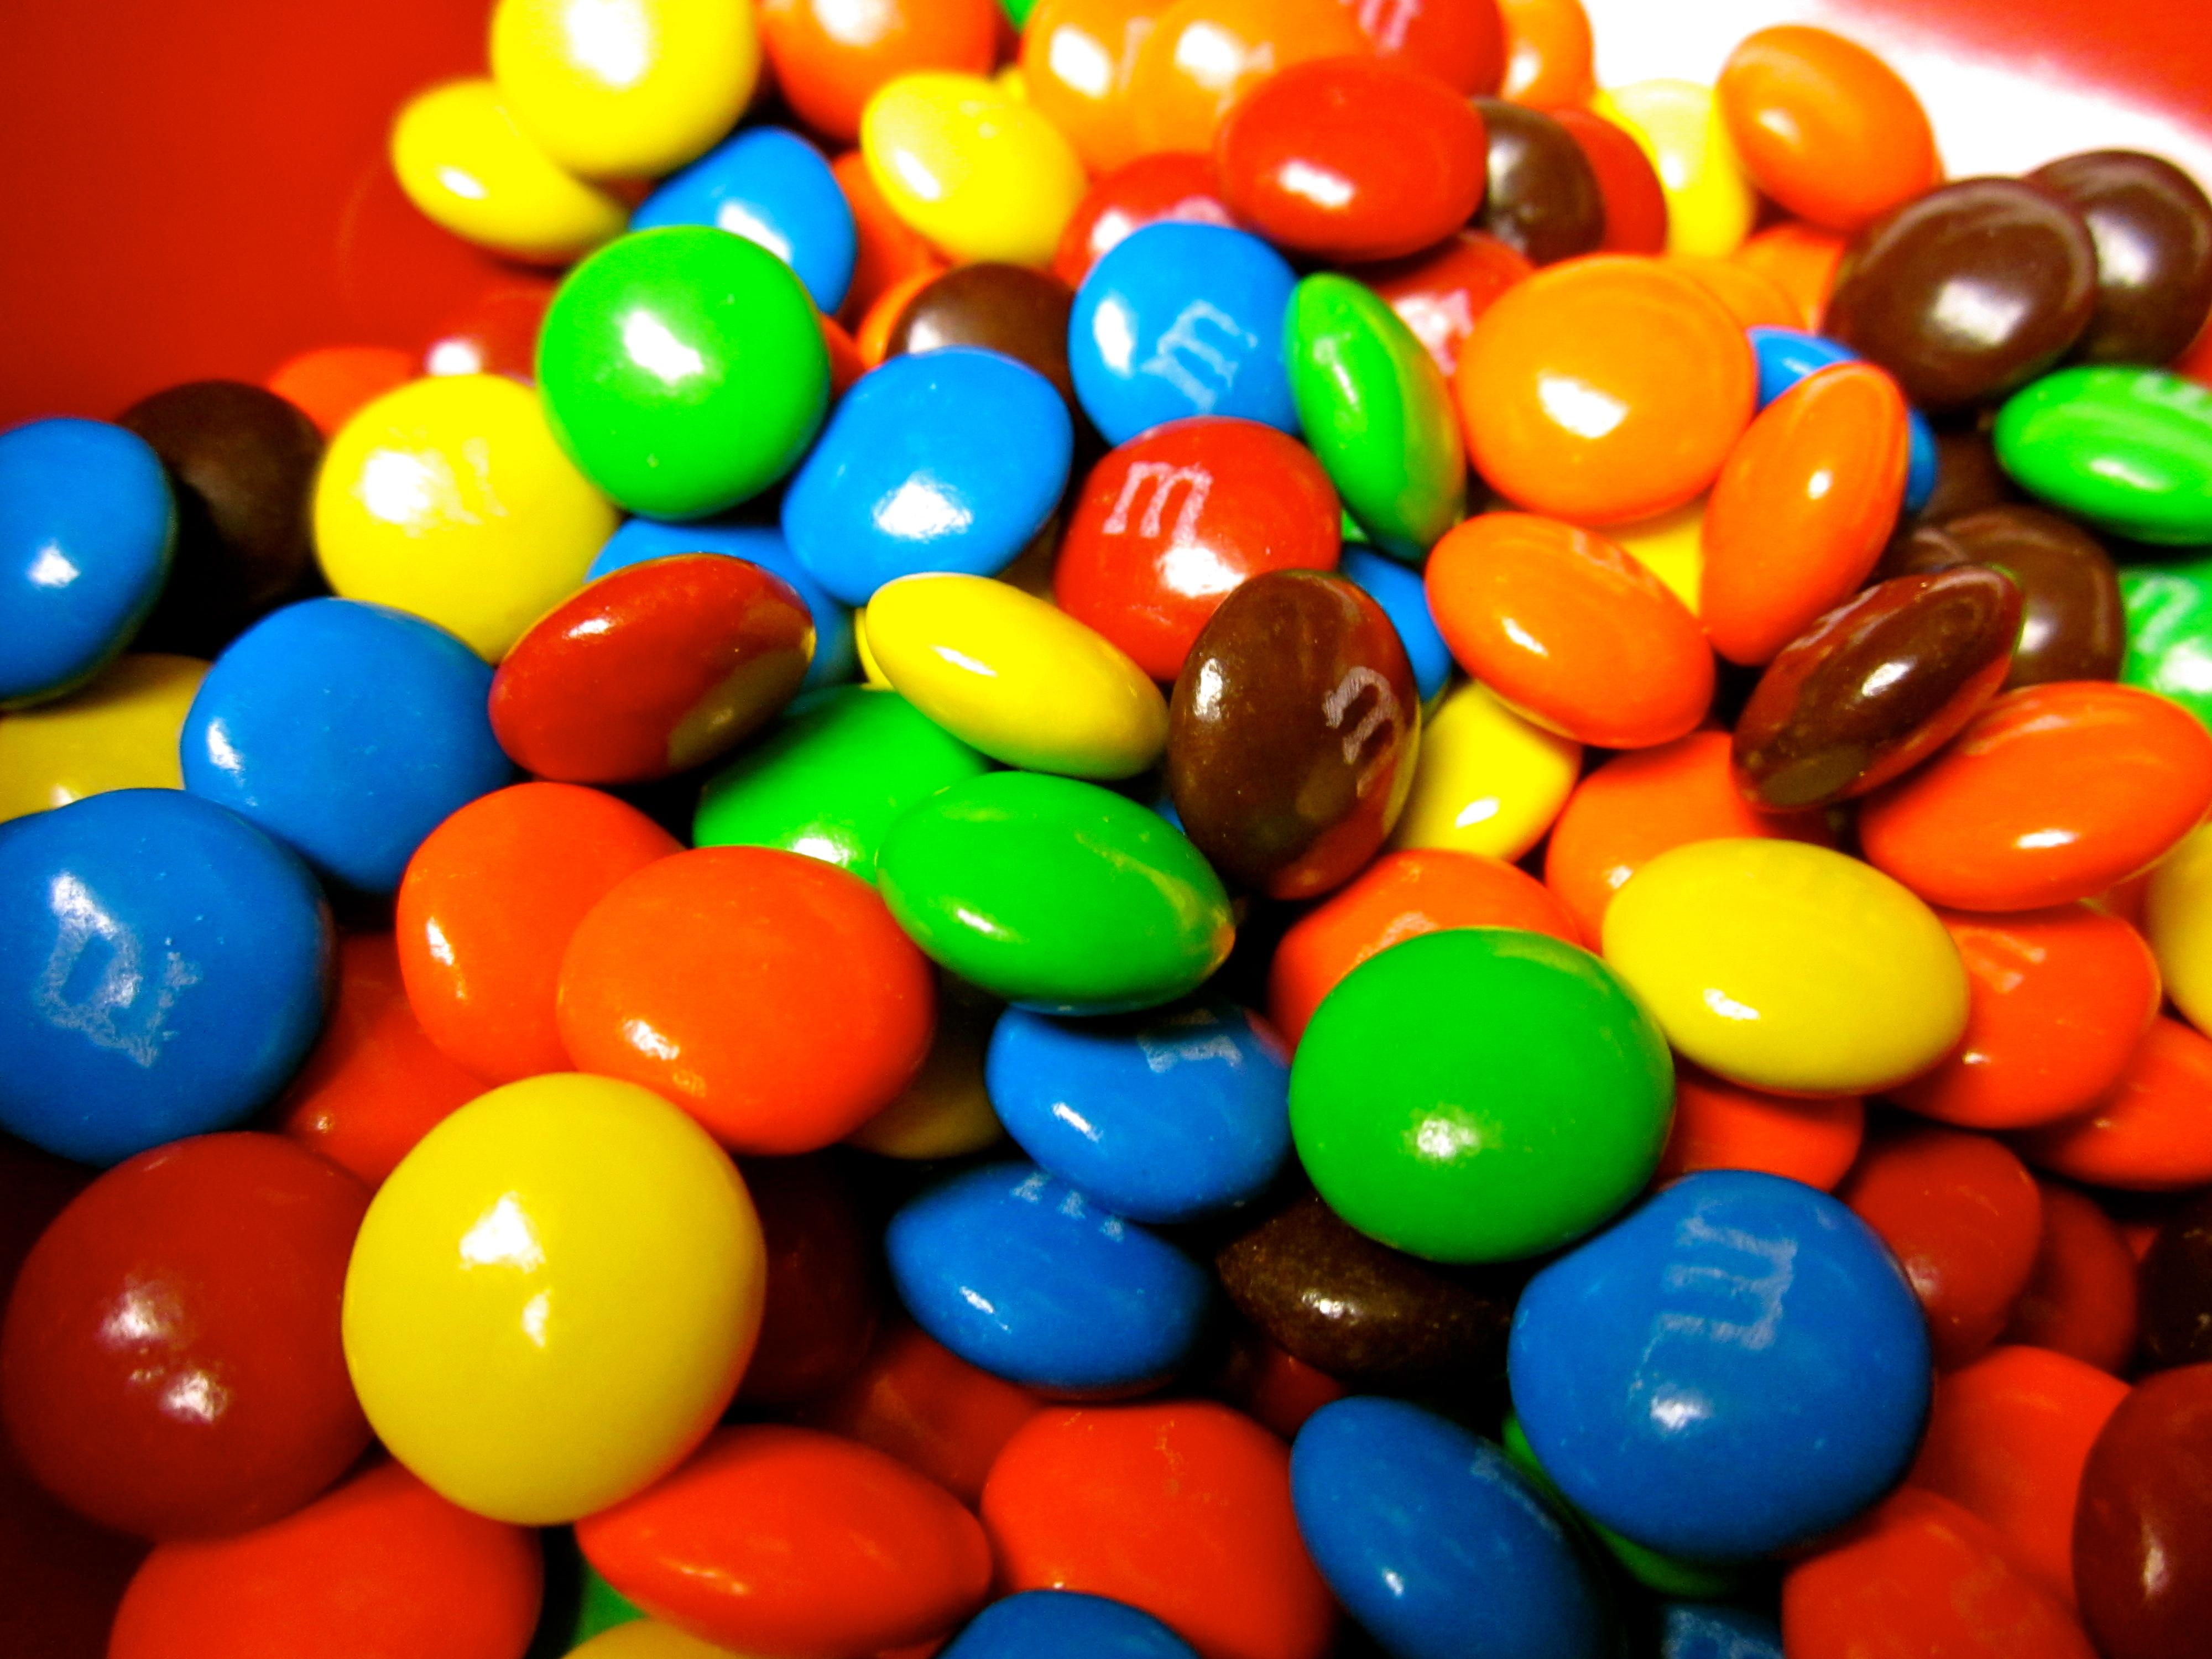 Rainbow MM Chocolate Chip Cookies EatWriteLove. ← M&M Candy Wallpaper